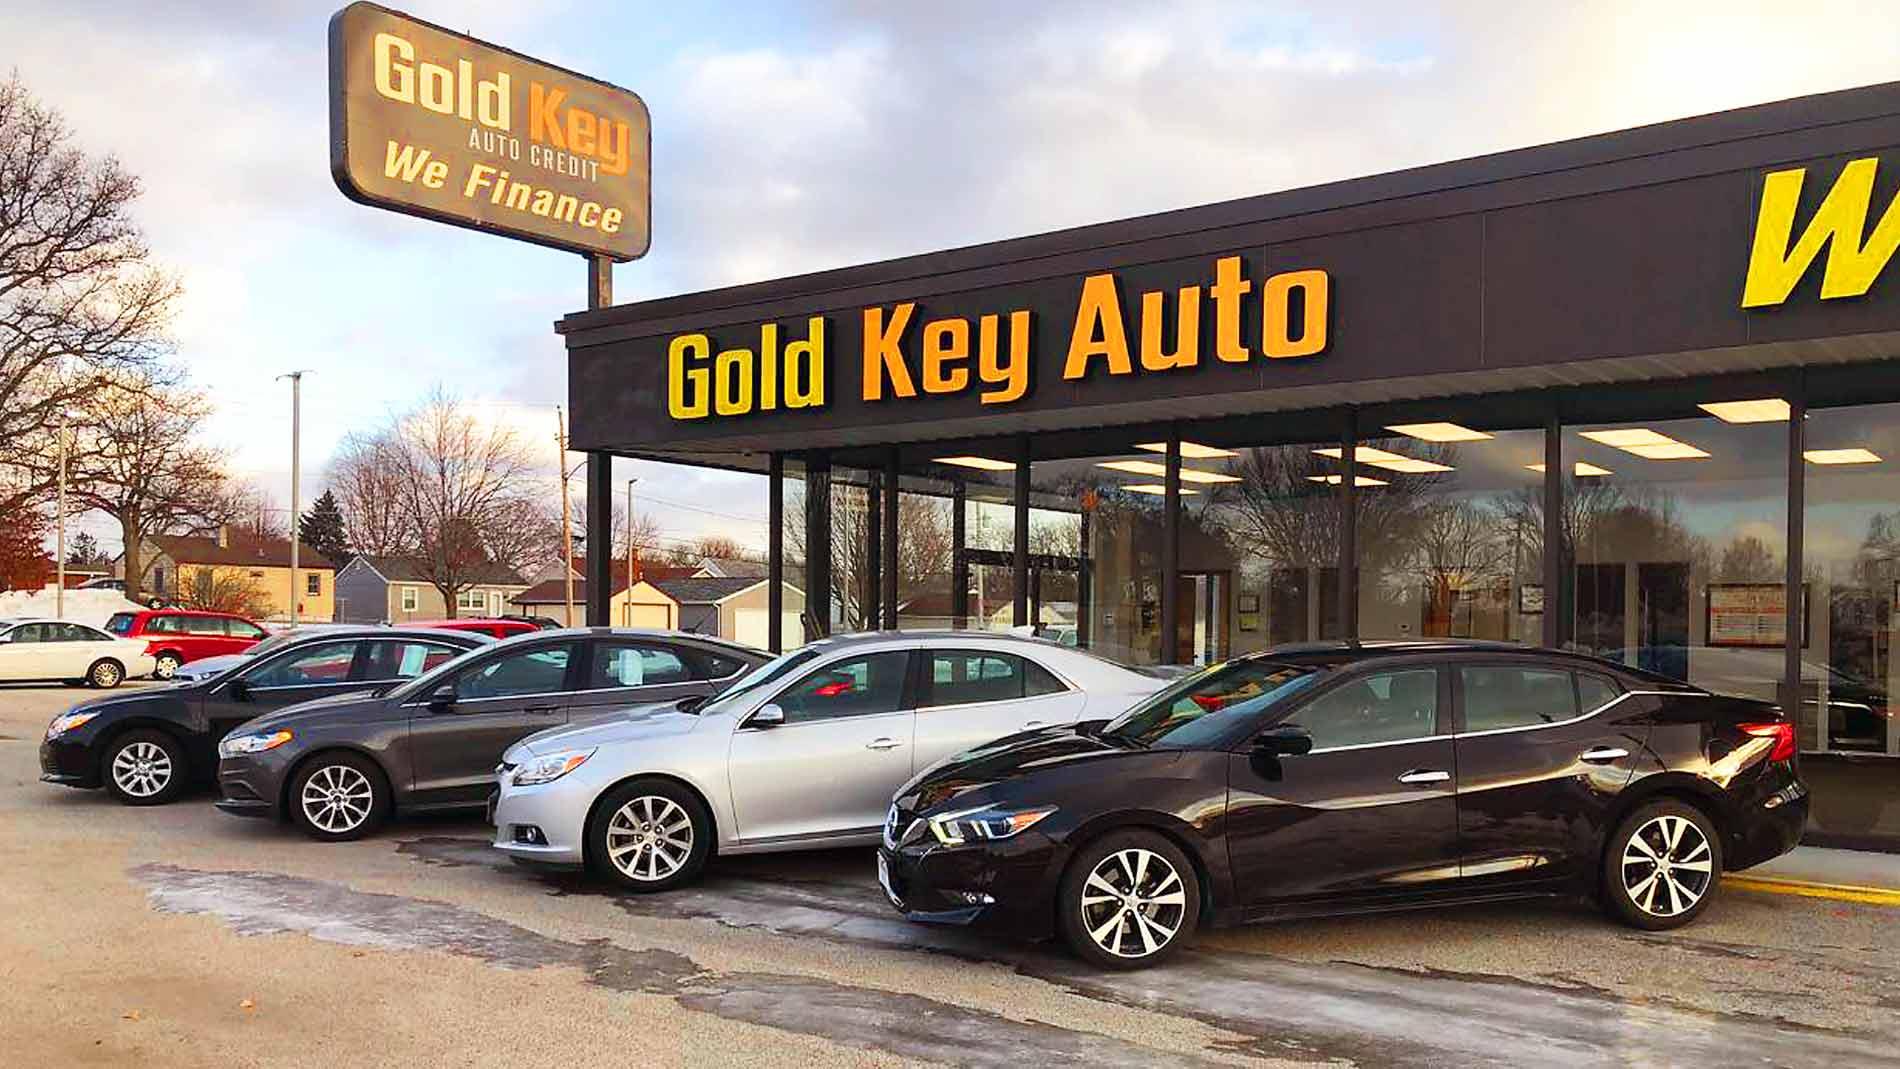 Goldkey Auto Sales Silvis Goldkey Auto Sales Silvis ::